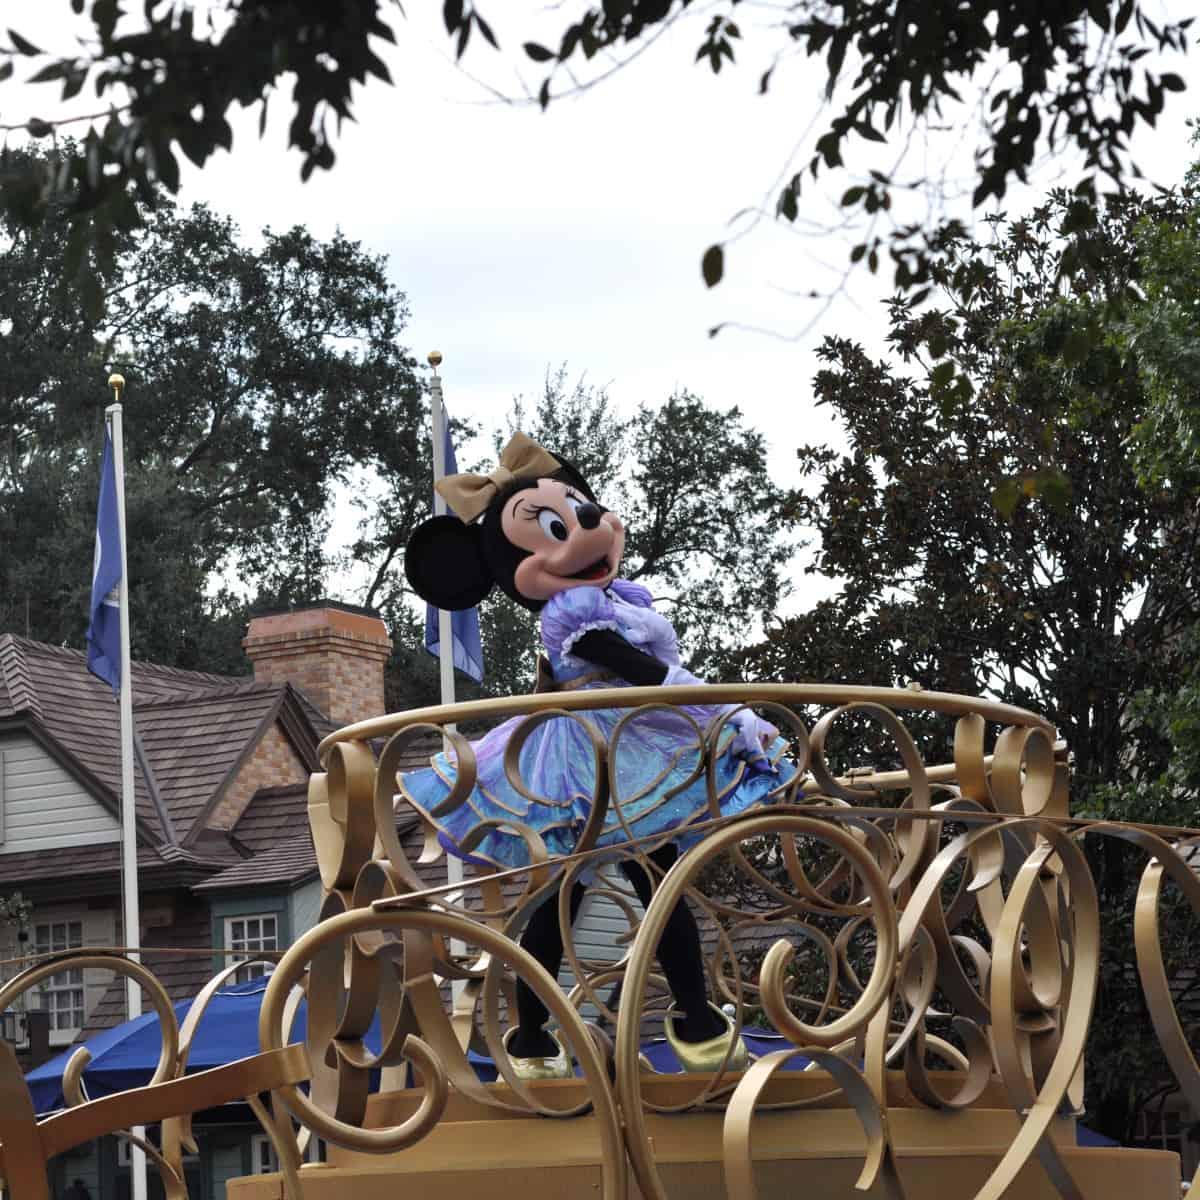 Minnie Mouse at Walt Disney World Parade